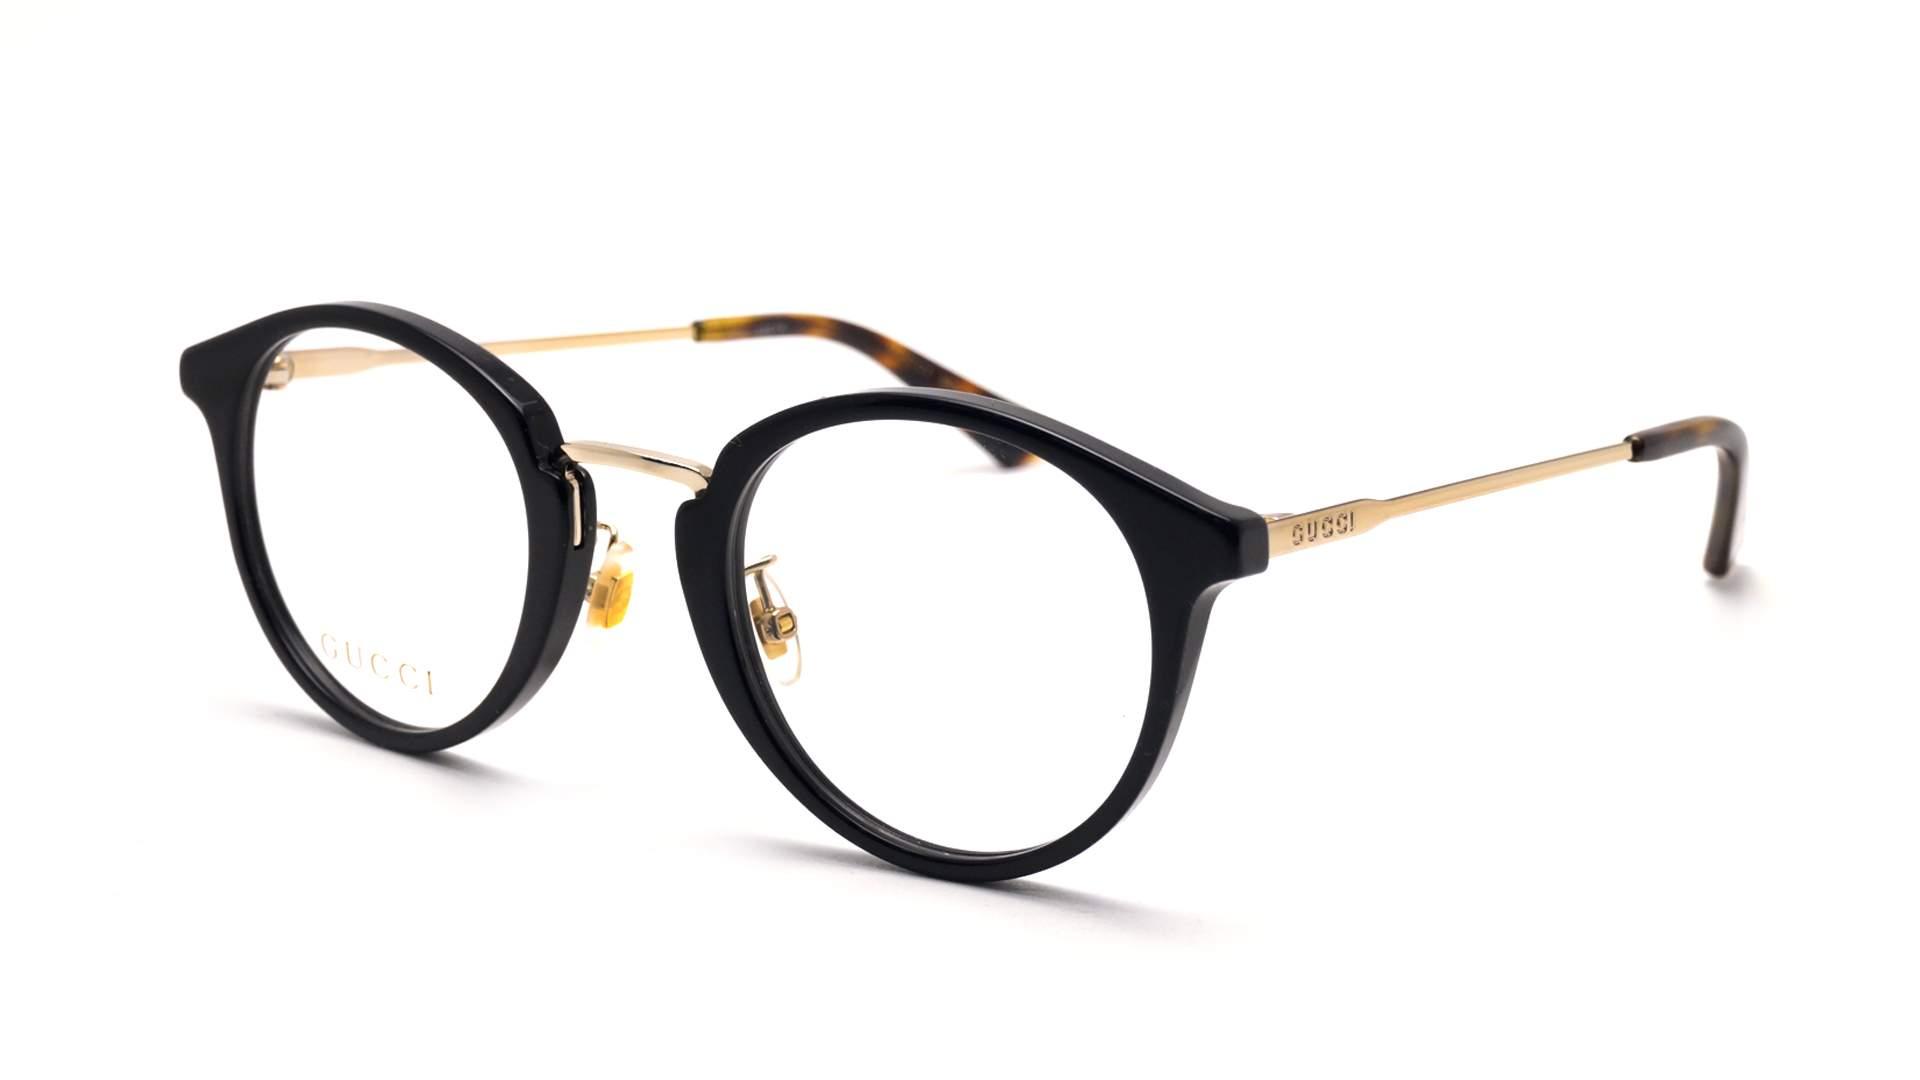 3f3b43f14fb Eyeglasses Gucci GG0322O 001 49-25 Black Medium